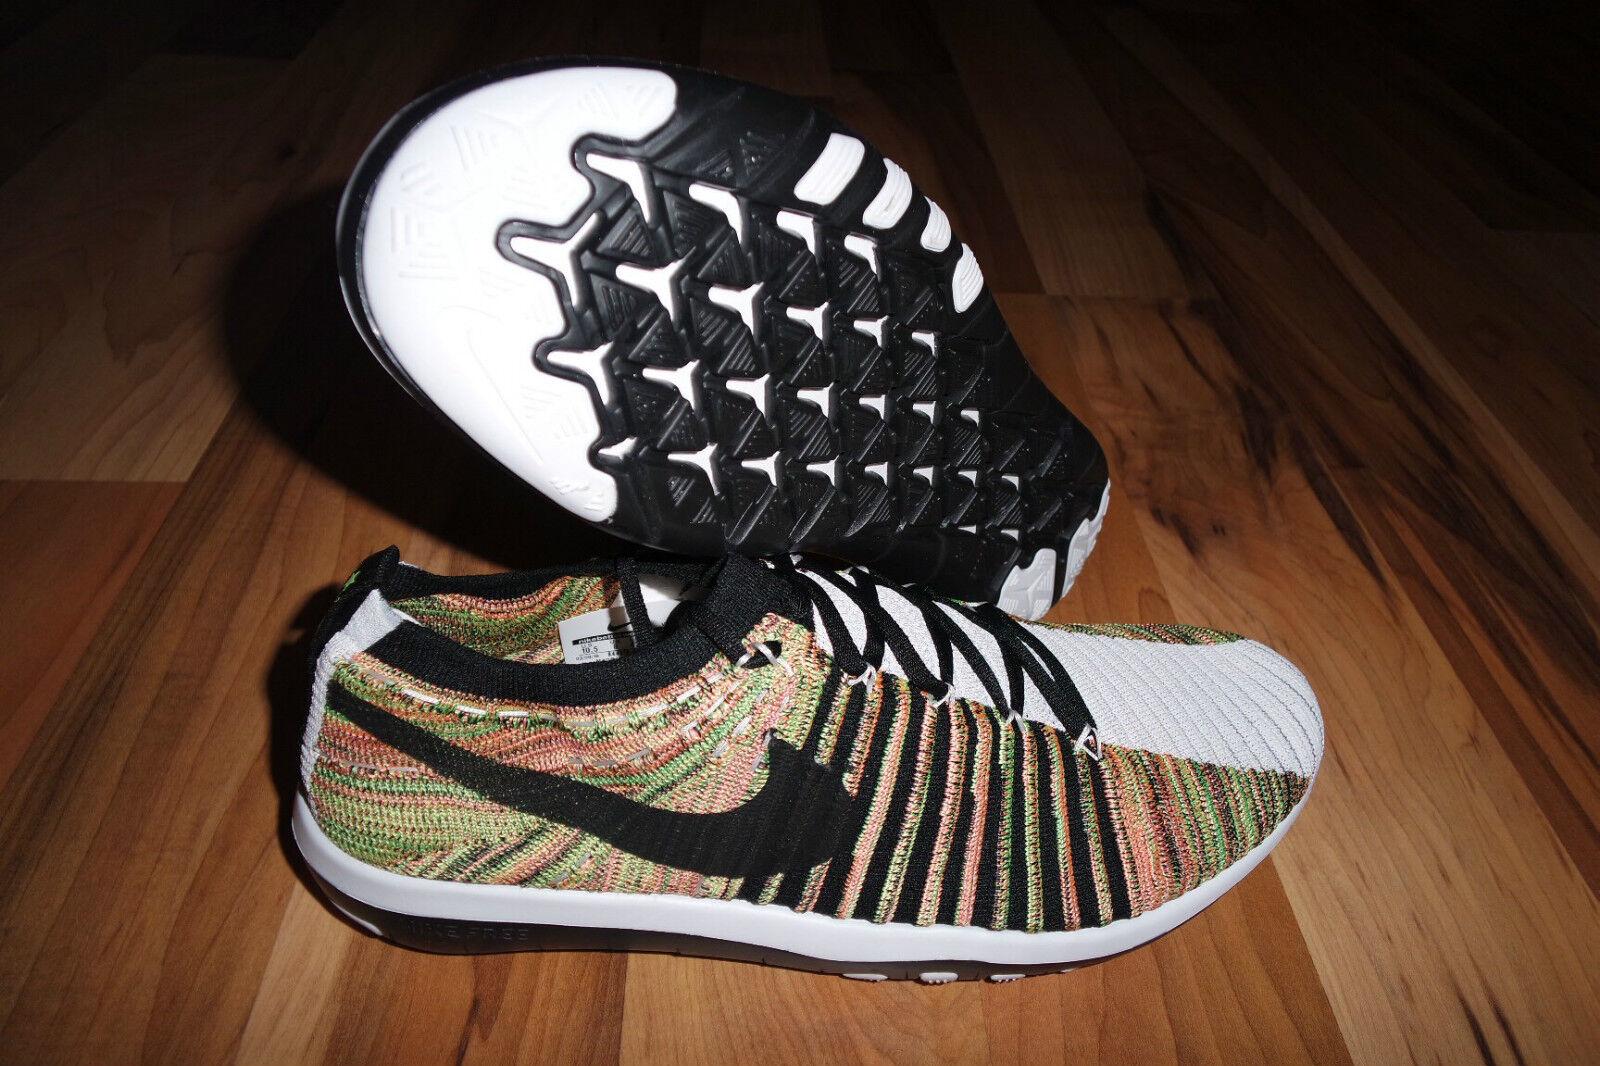 Nike Damens Free Transform Flyknit FK SUN Riccardo Tisci 844818 900 SZ 10.5